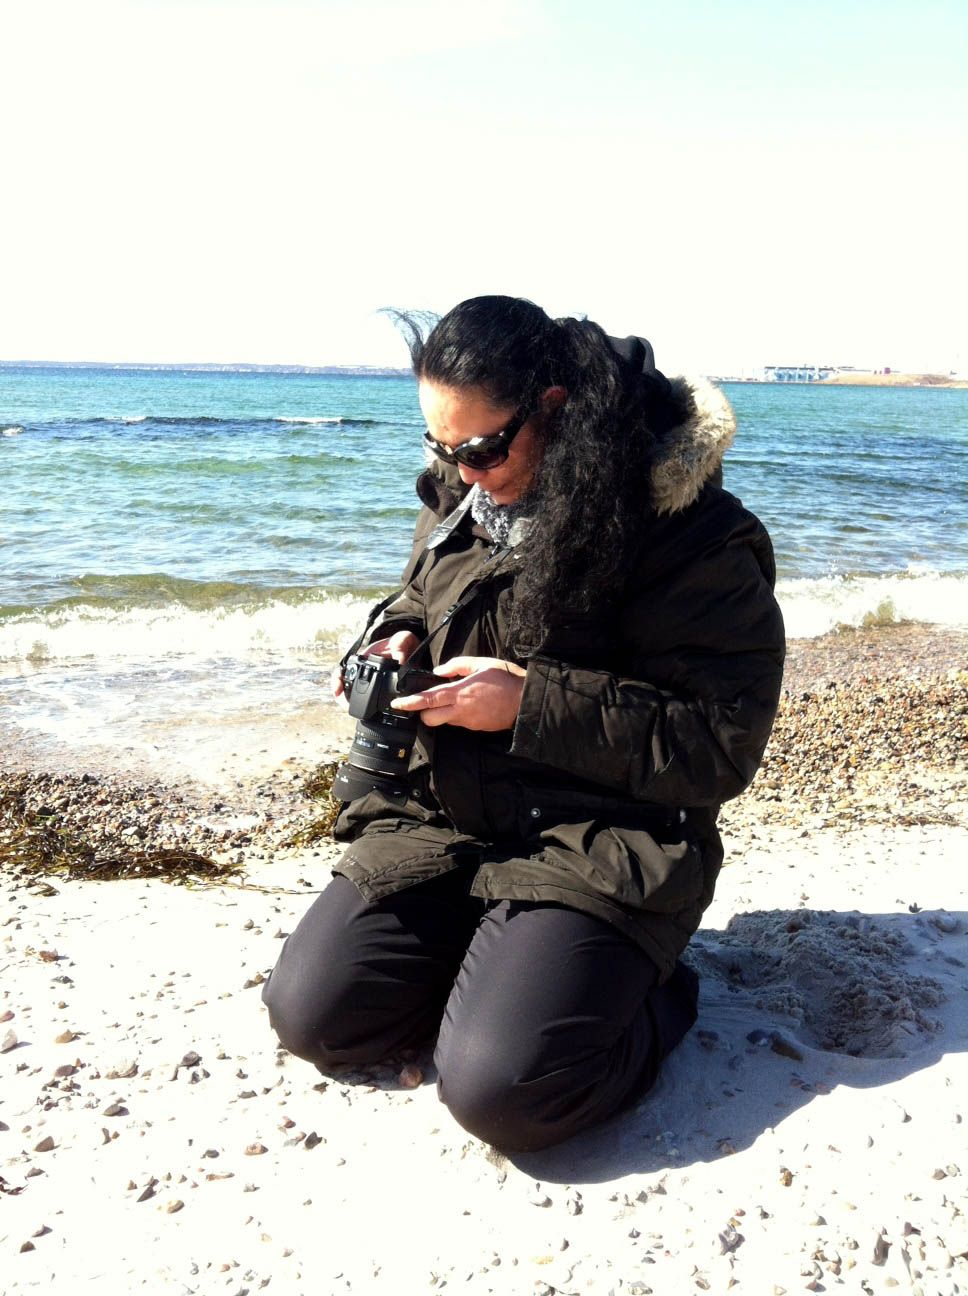 Me. Photographer @Marie Sandberg